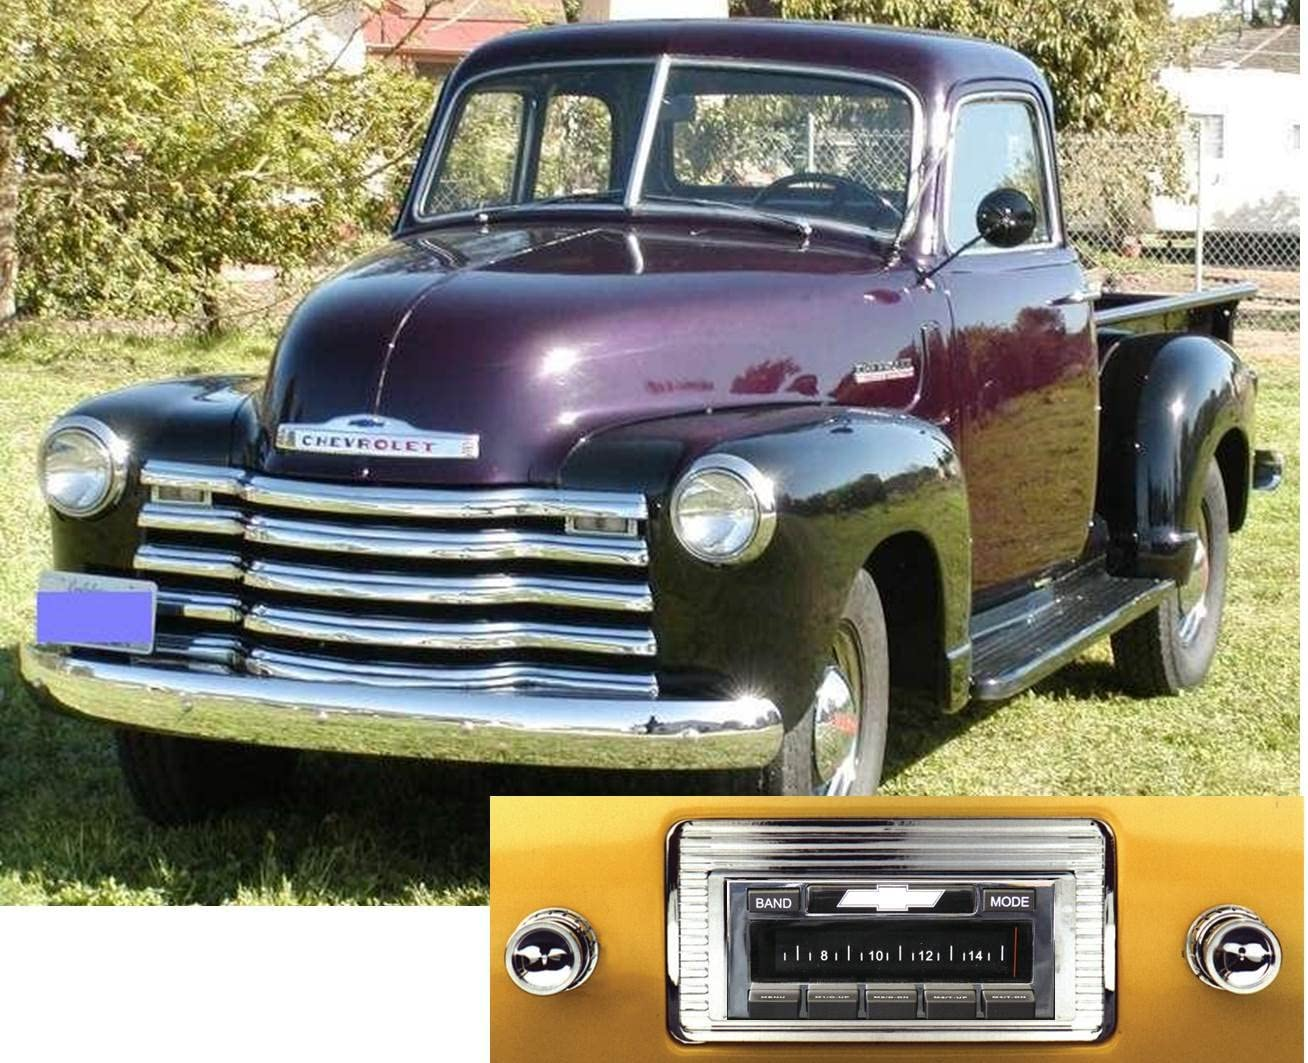 Custom Autosound Stereo compatible with 1947-1953 Chevy Truck USA-630 II High Power 300 watt AM FM Car Stereo//Radio